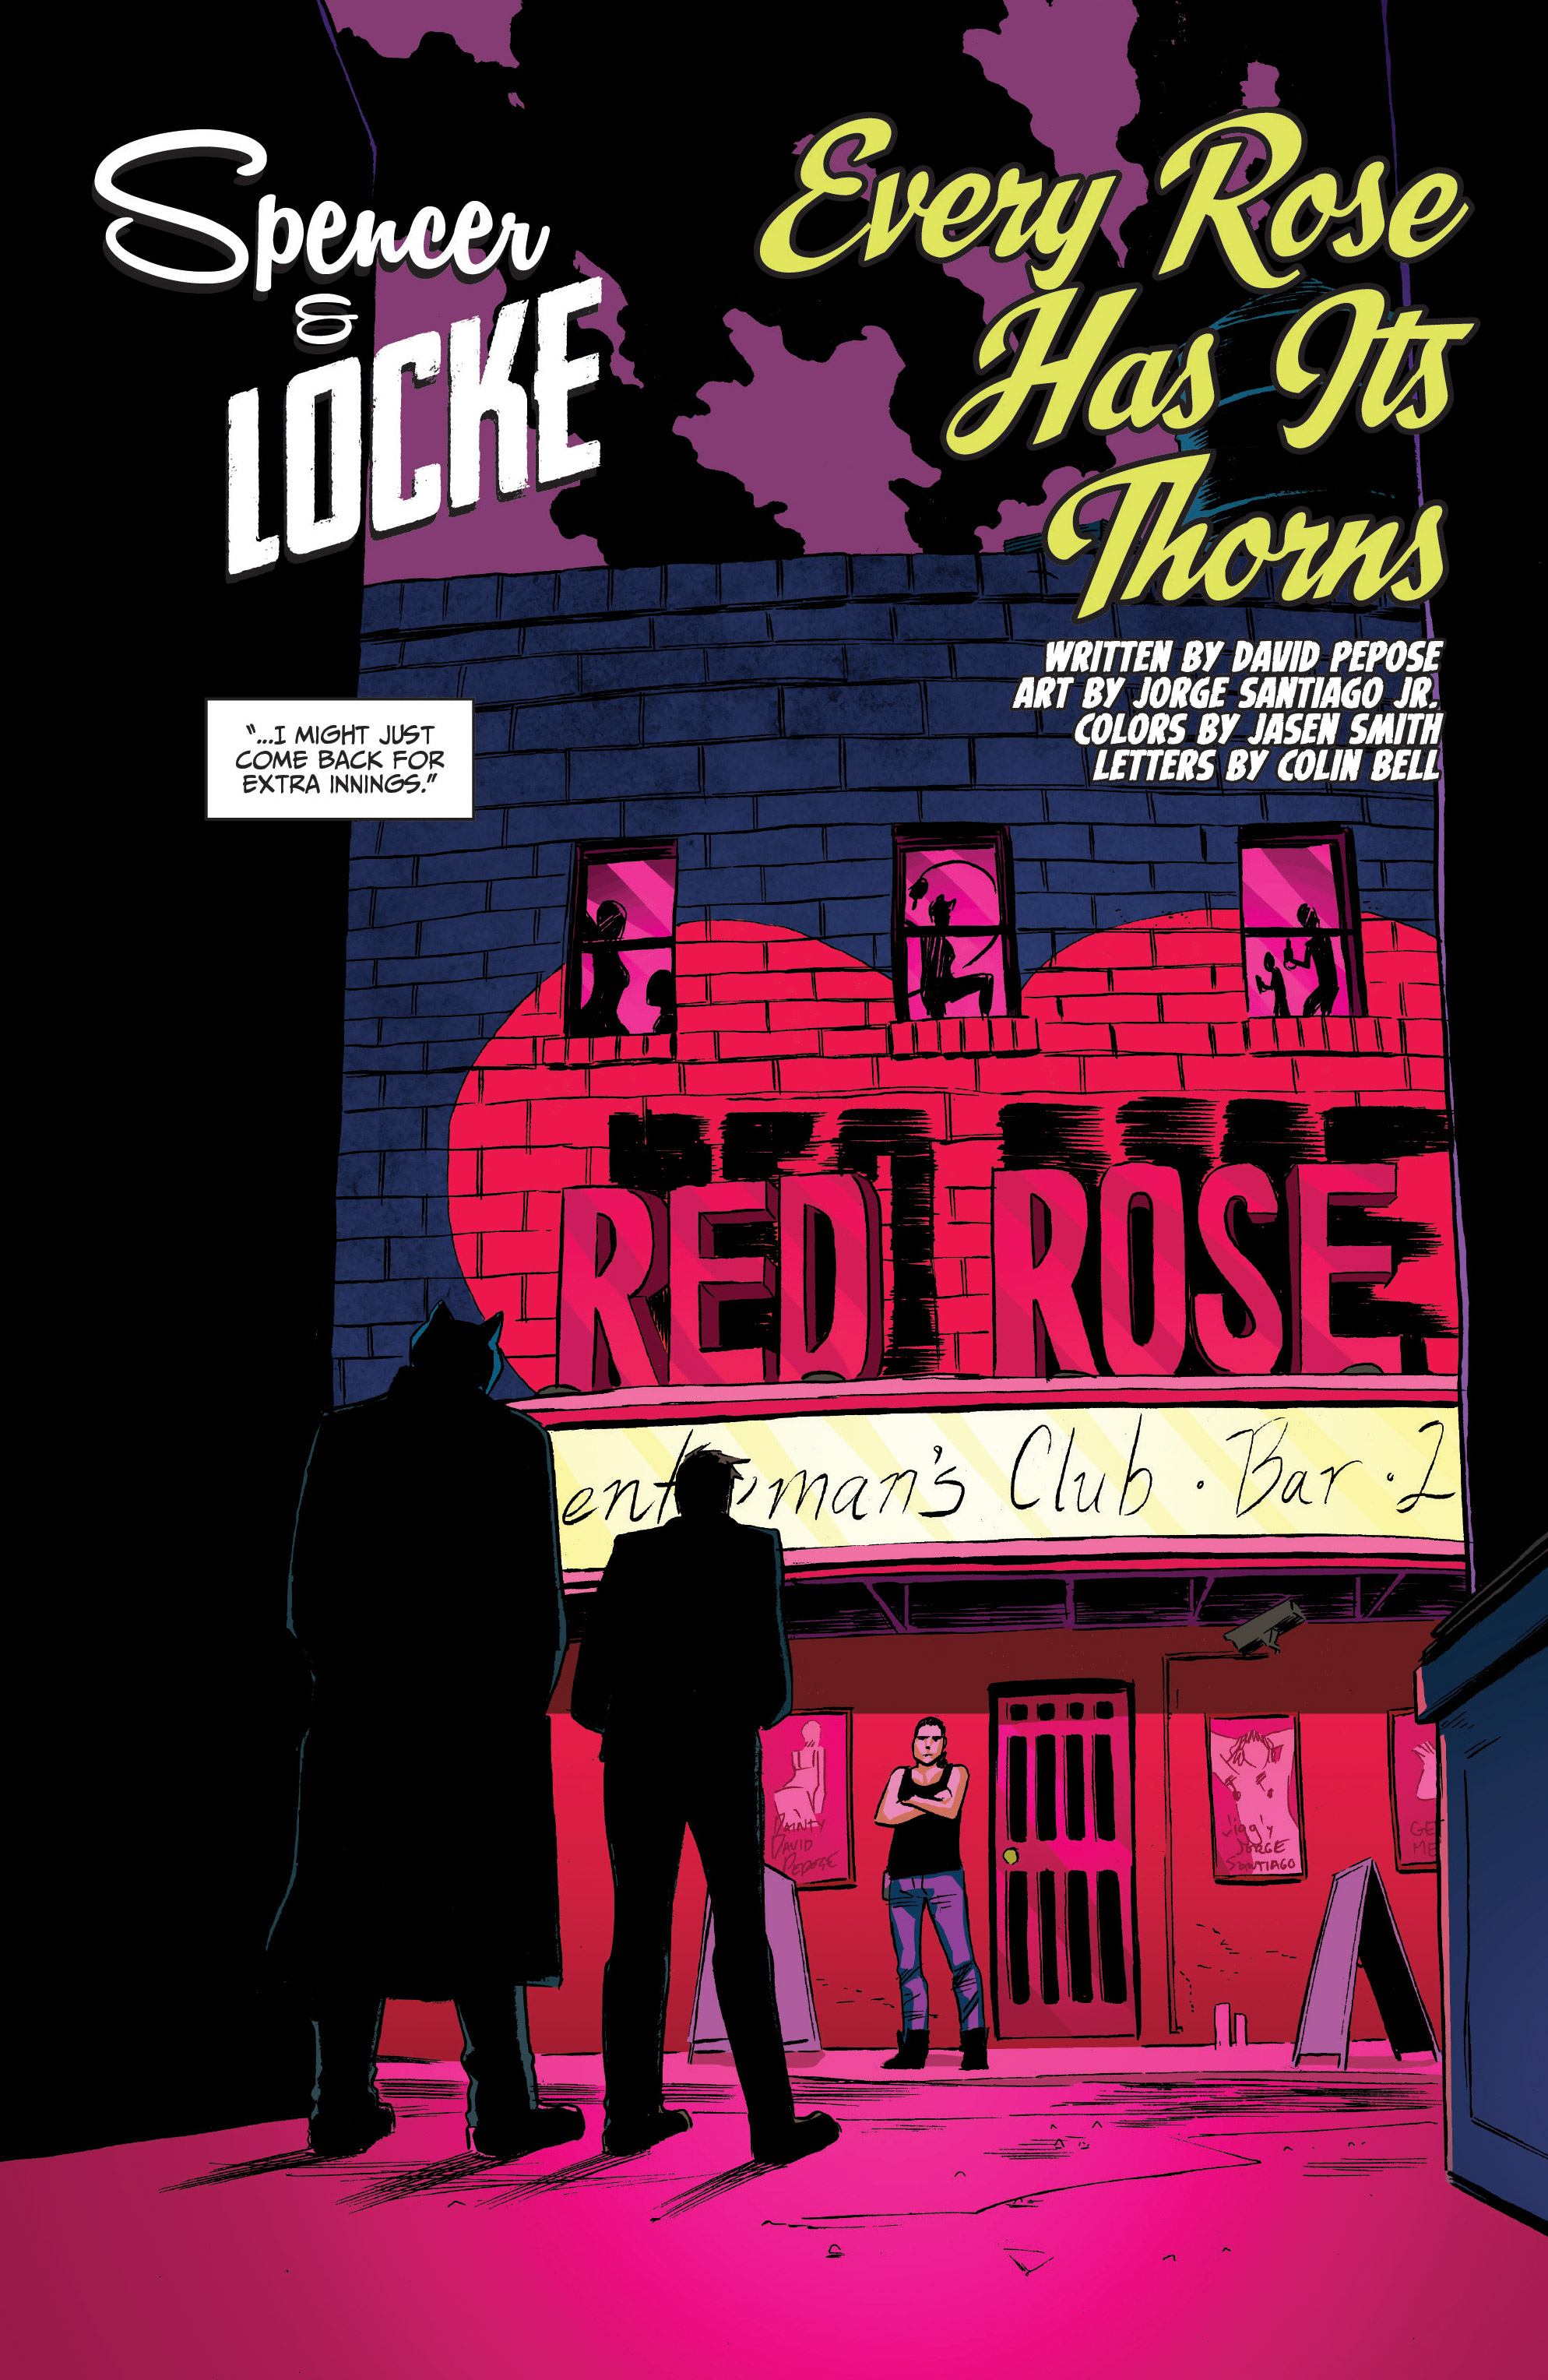 Read online Spencer & Locke comic -  Issue #2 - 7